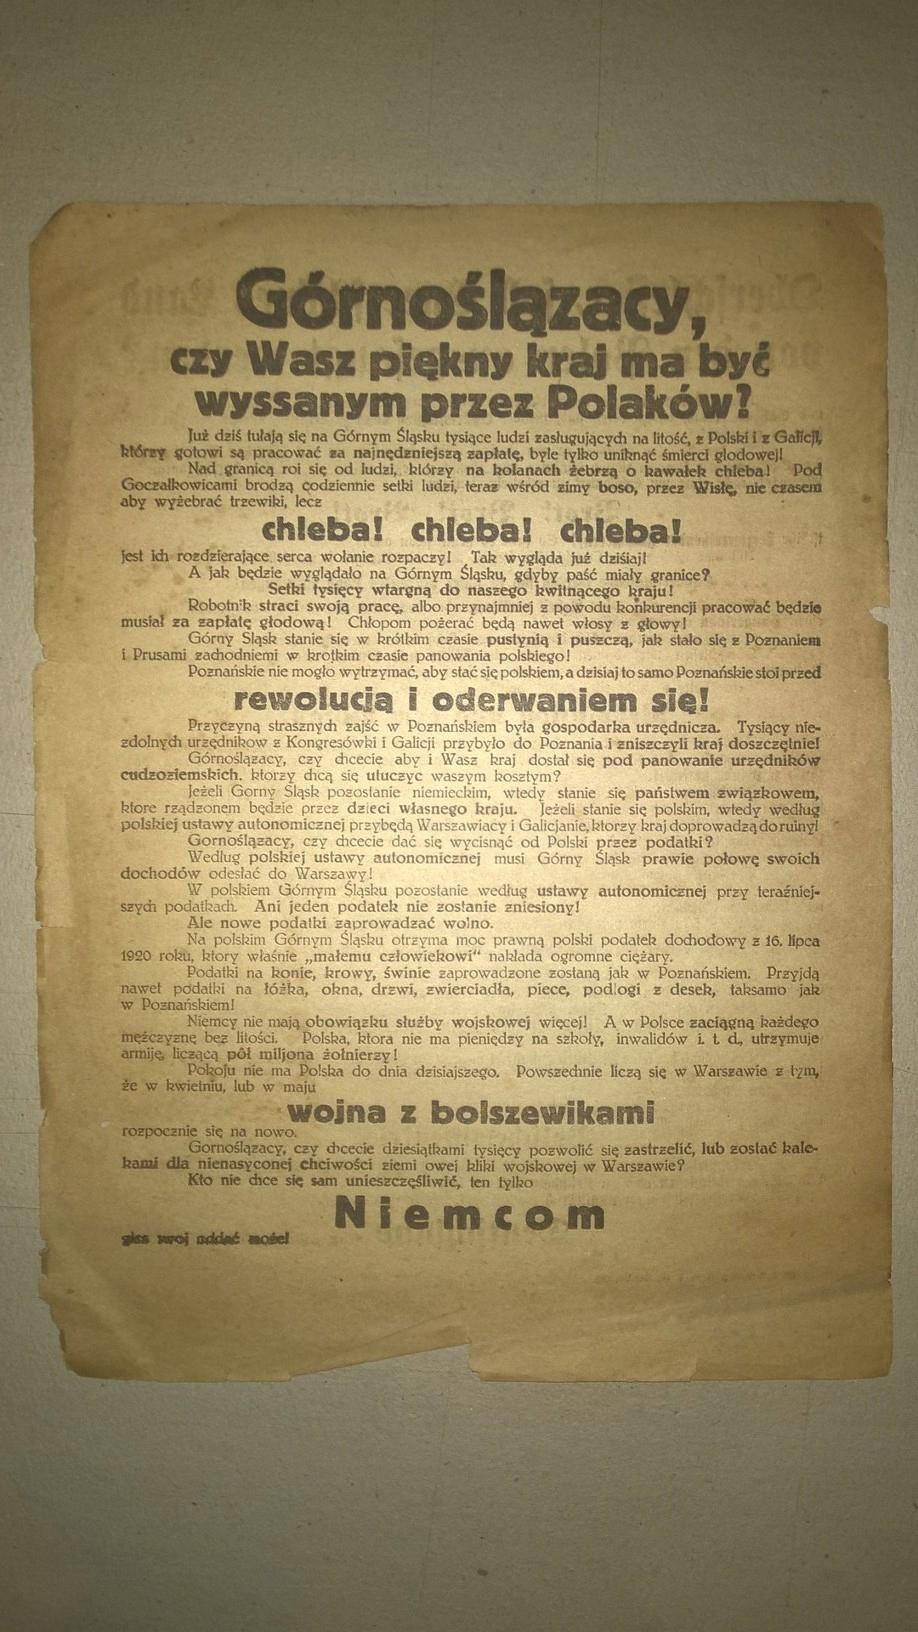 Plakat Proniemiecki Plebiscyt Górny śląsk